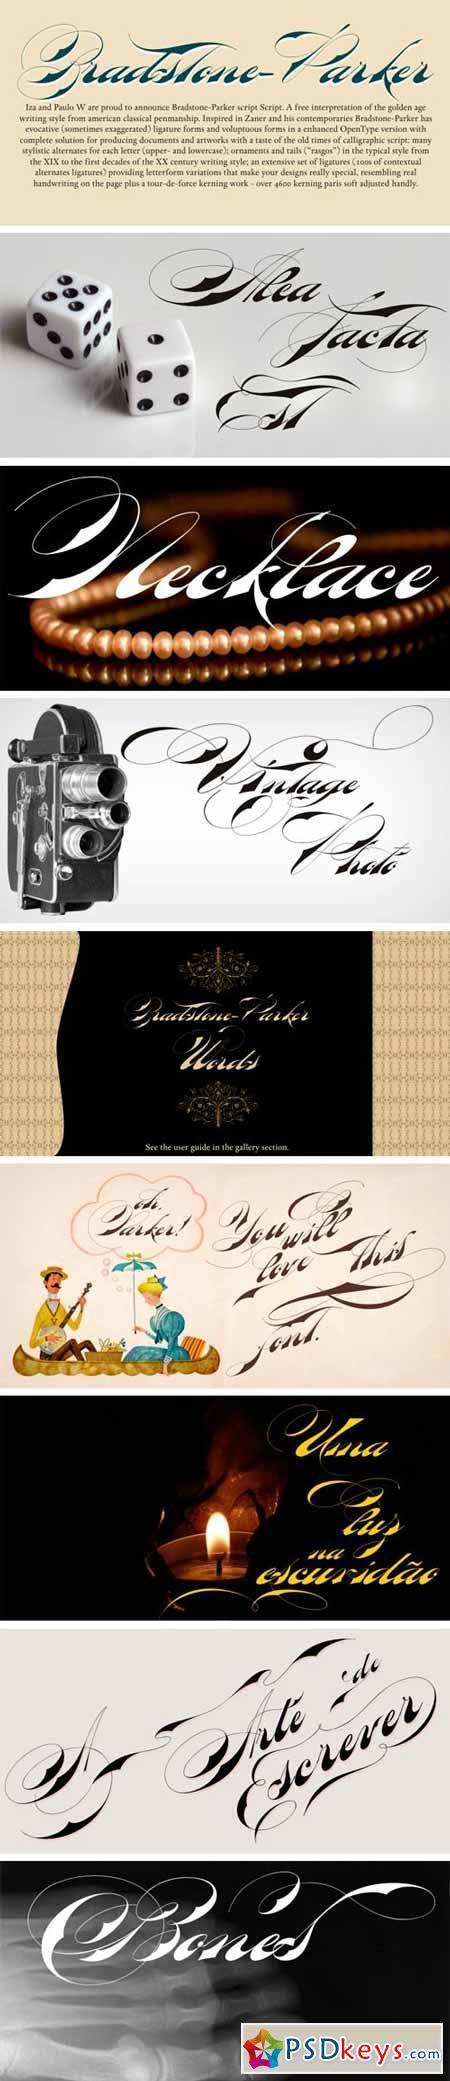 Bradstone-Parker Script Font $65